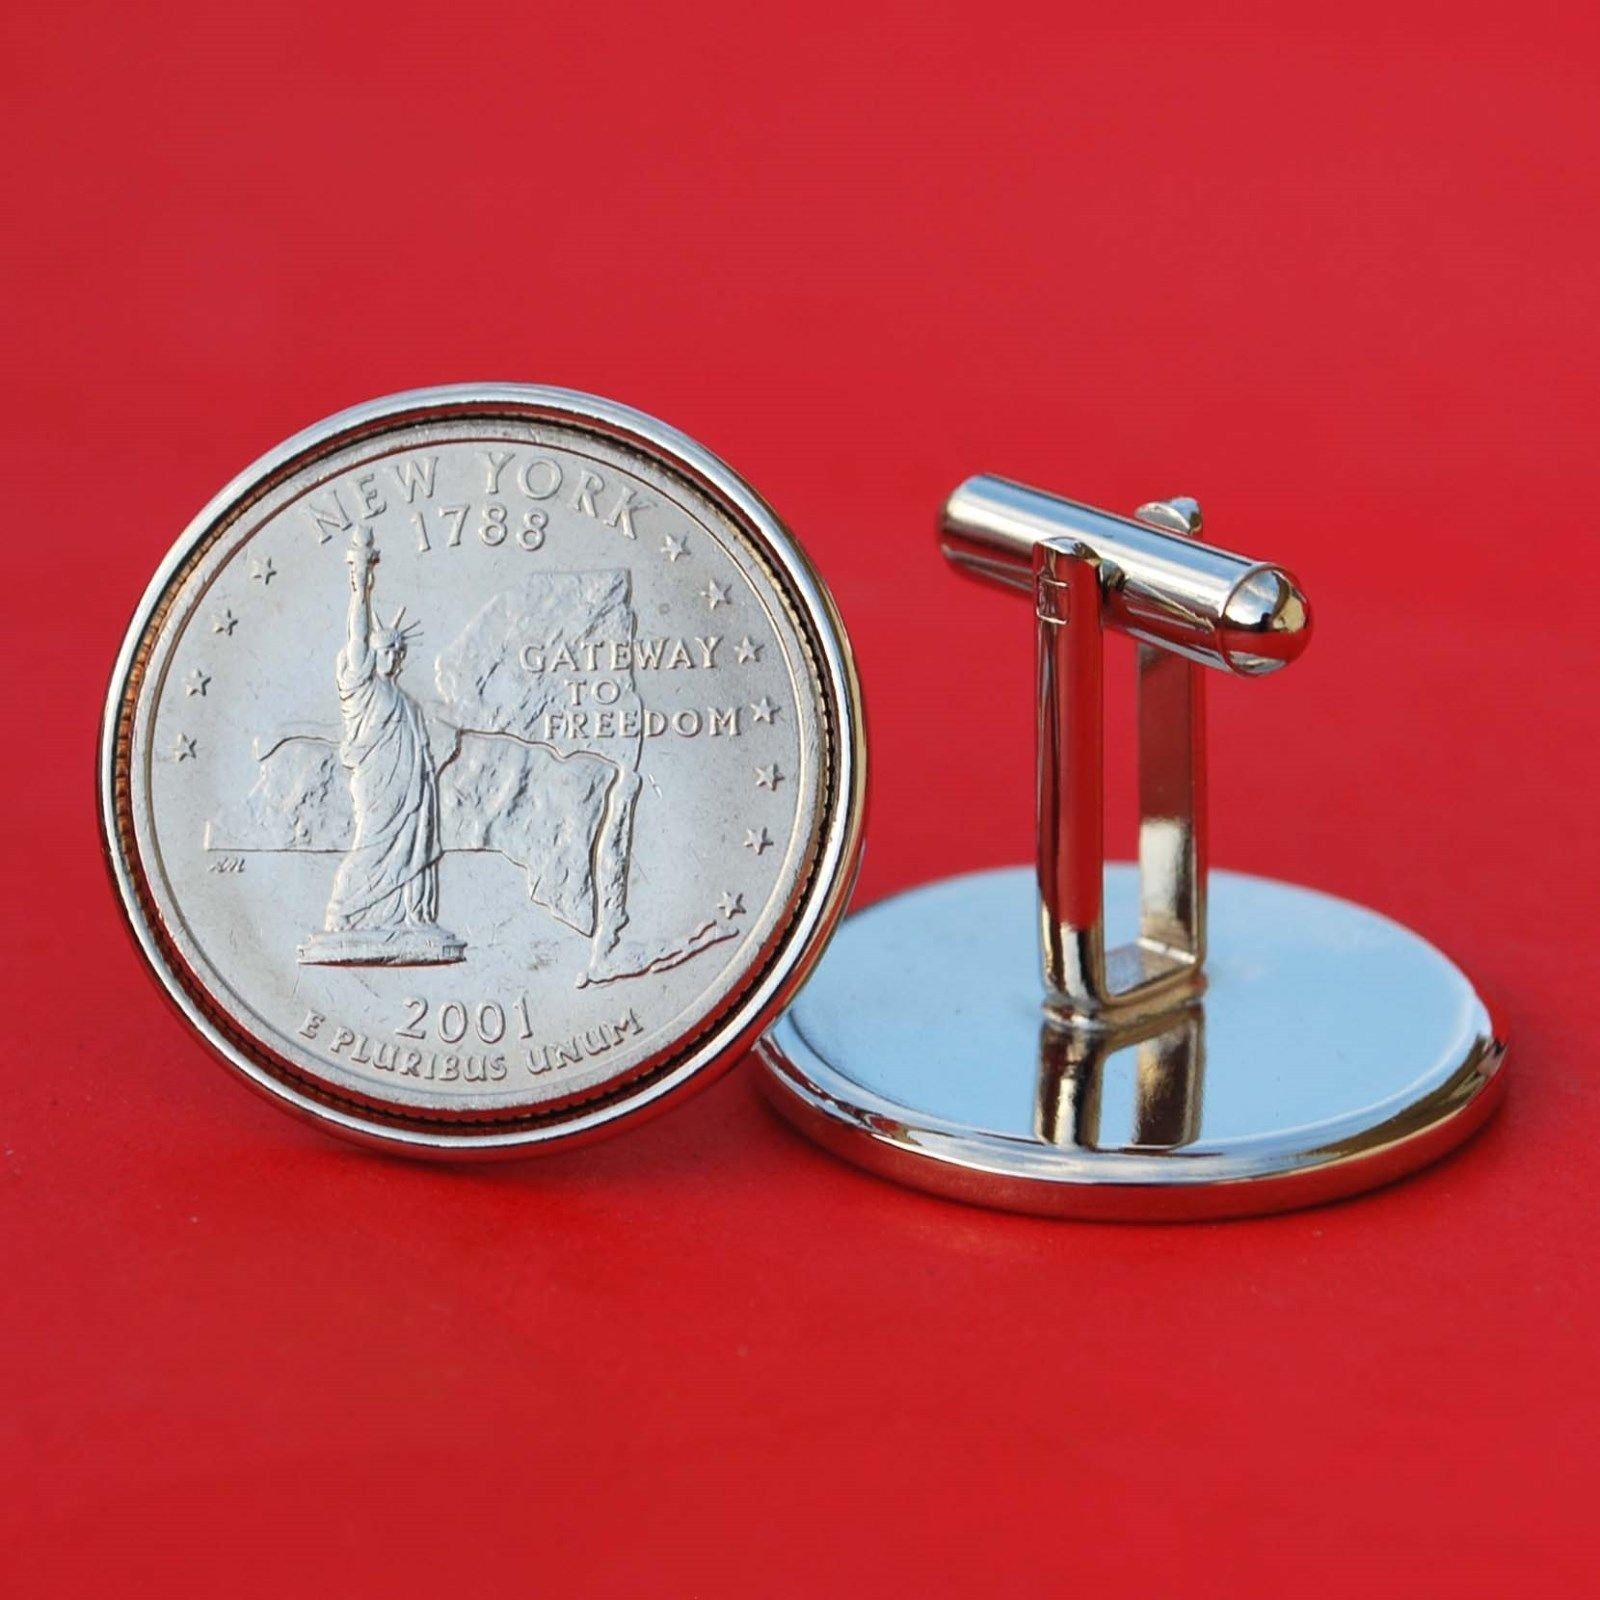 US 2001 New York State Quarters Bu Unc Coins Cufflinks NEW